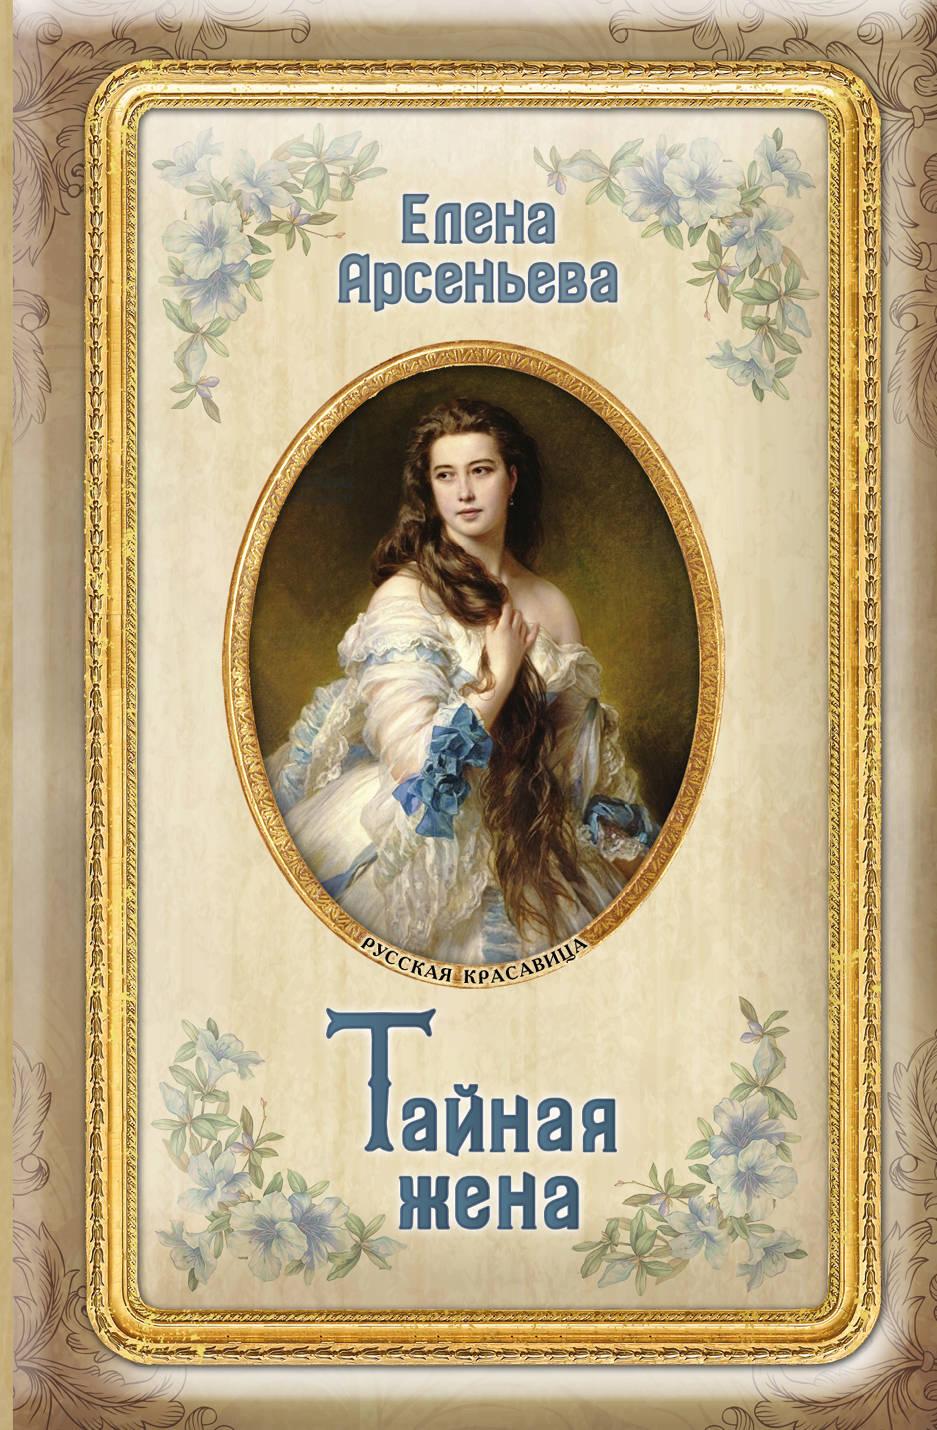 Елена Арсеньева Тайная жена